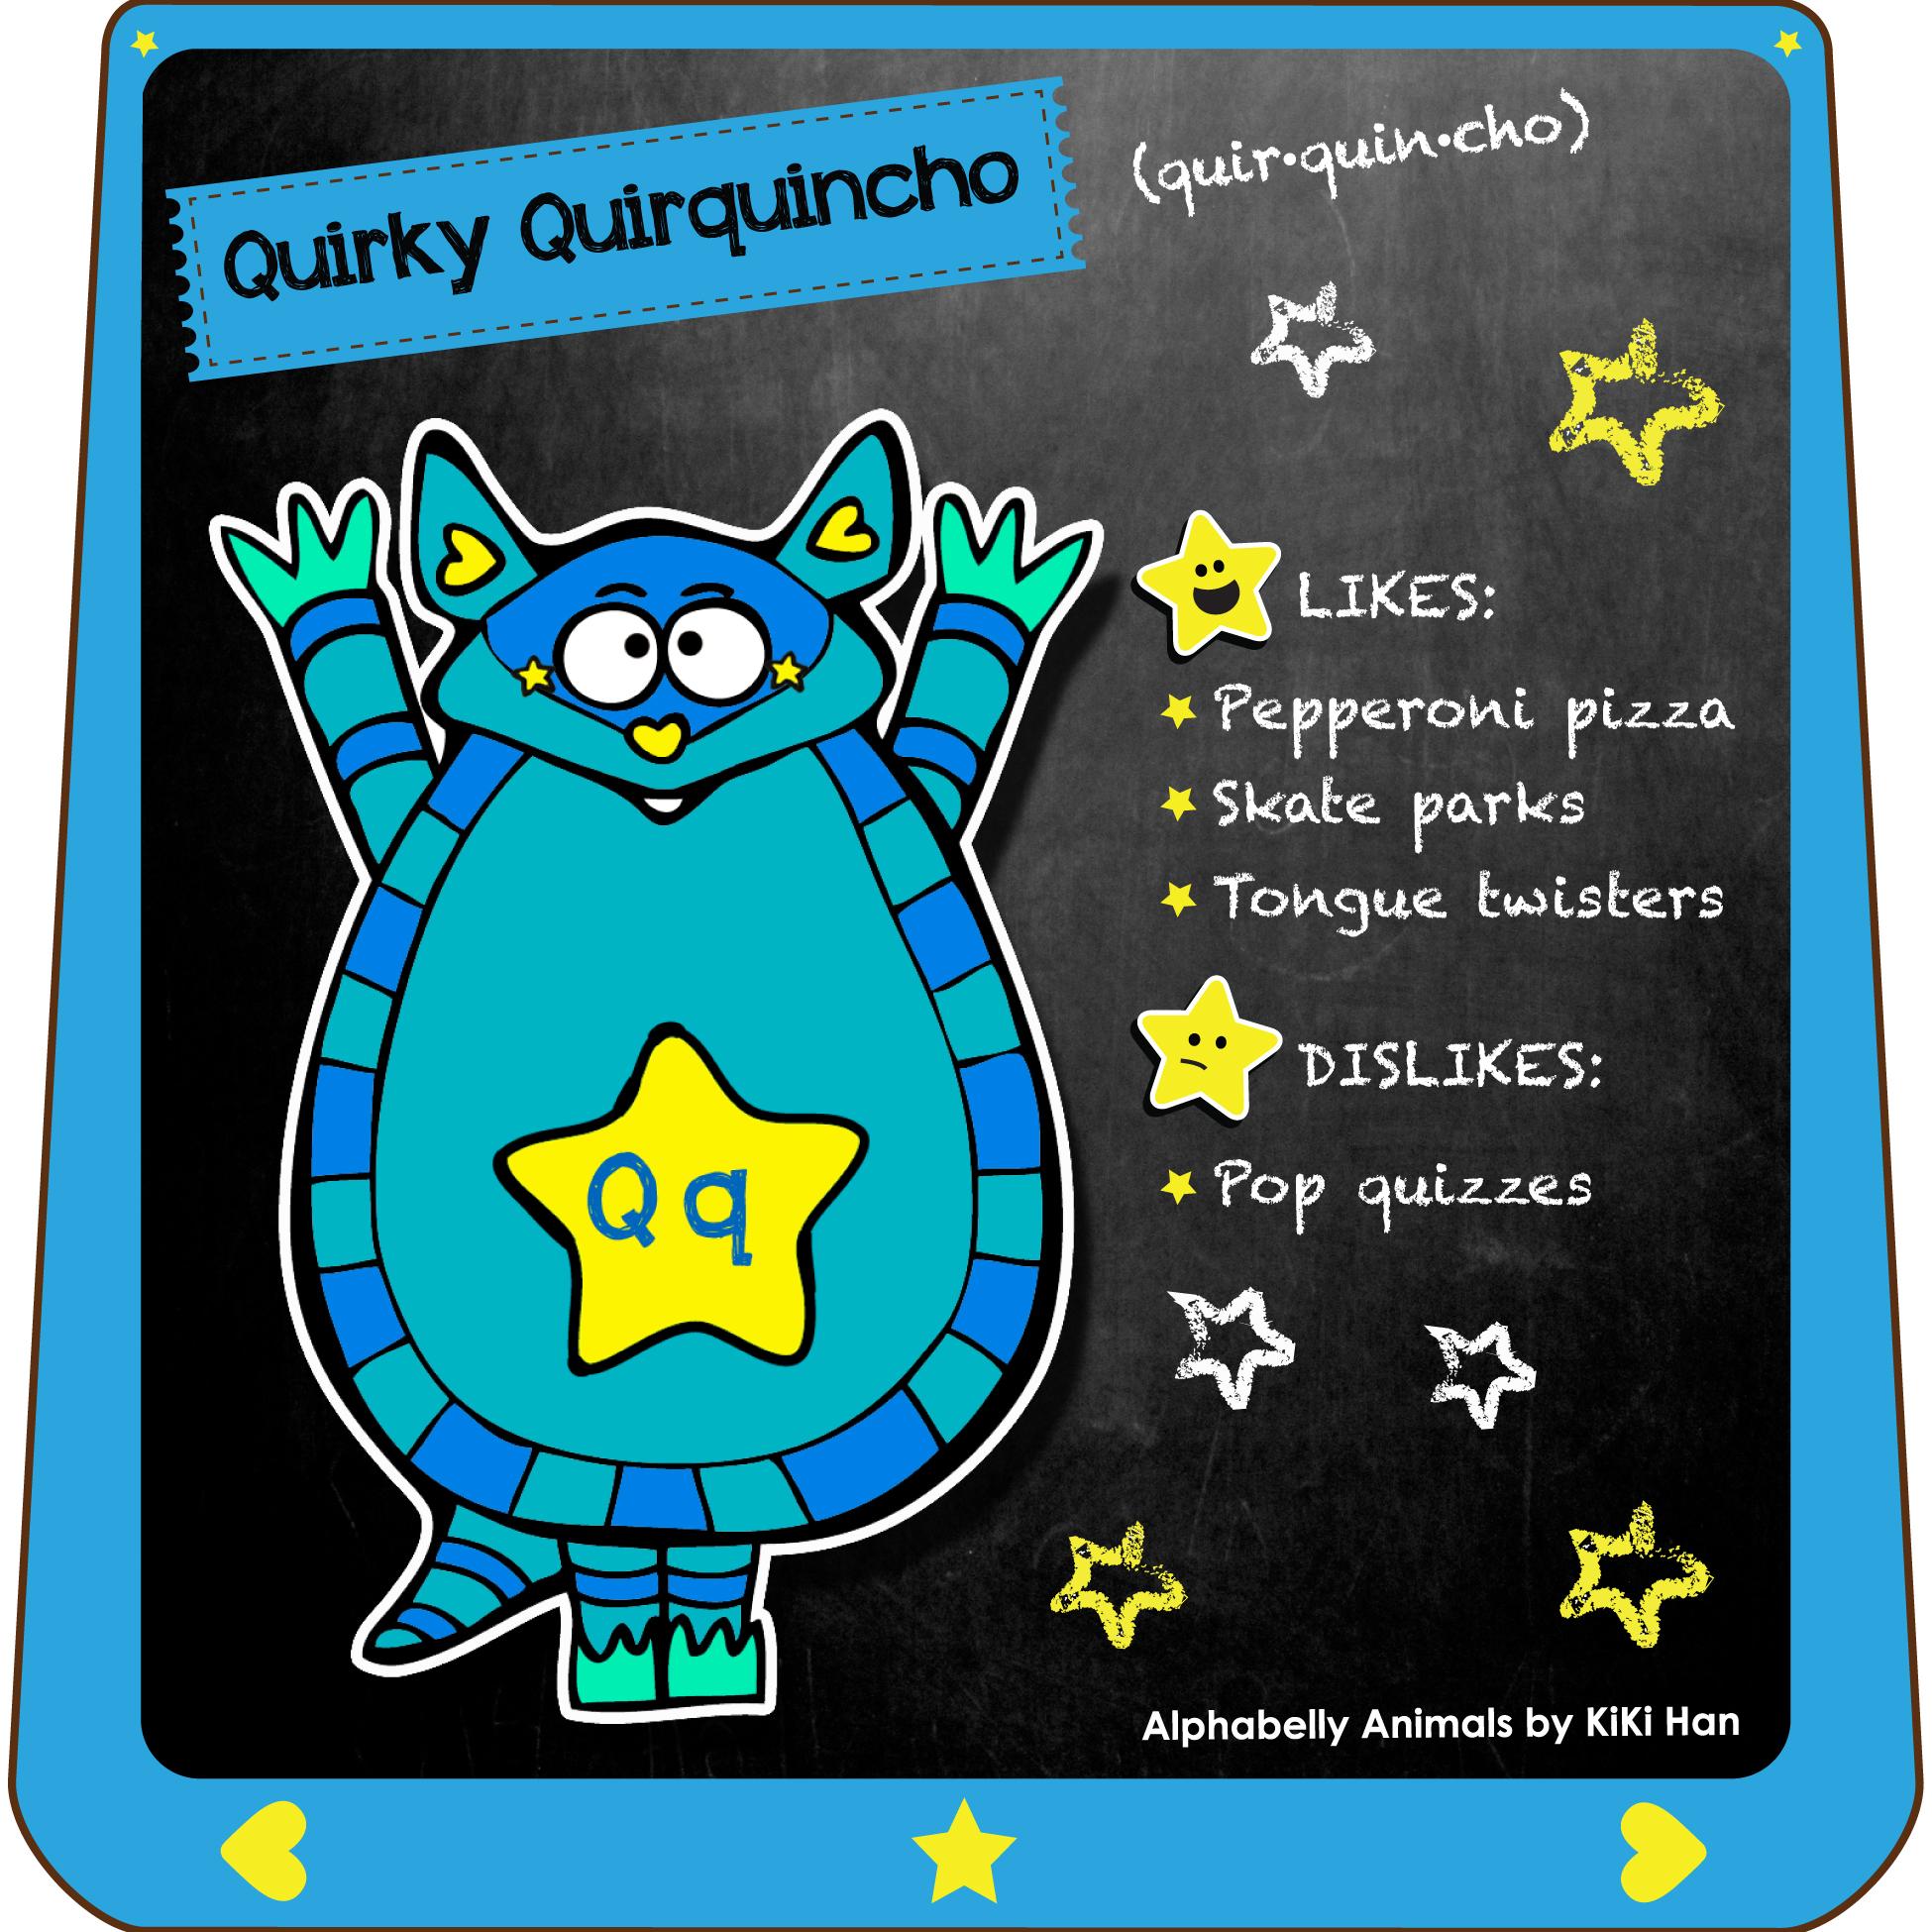 Quirquincho I KiKi Han I KiKiHan I GeekyKiKi I Geeky KiKi I Missgeekykiki I Cutiecons I Cutiecon I Cutie Con I Alphabellies I Alphabelly I A to Z Animal Poster